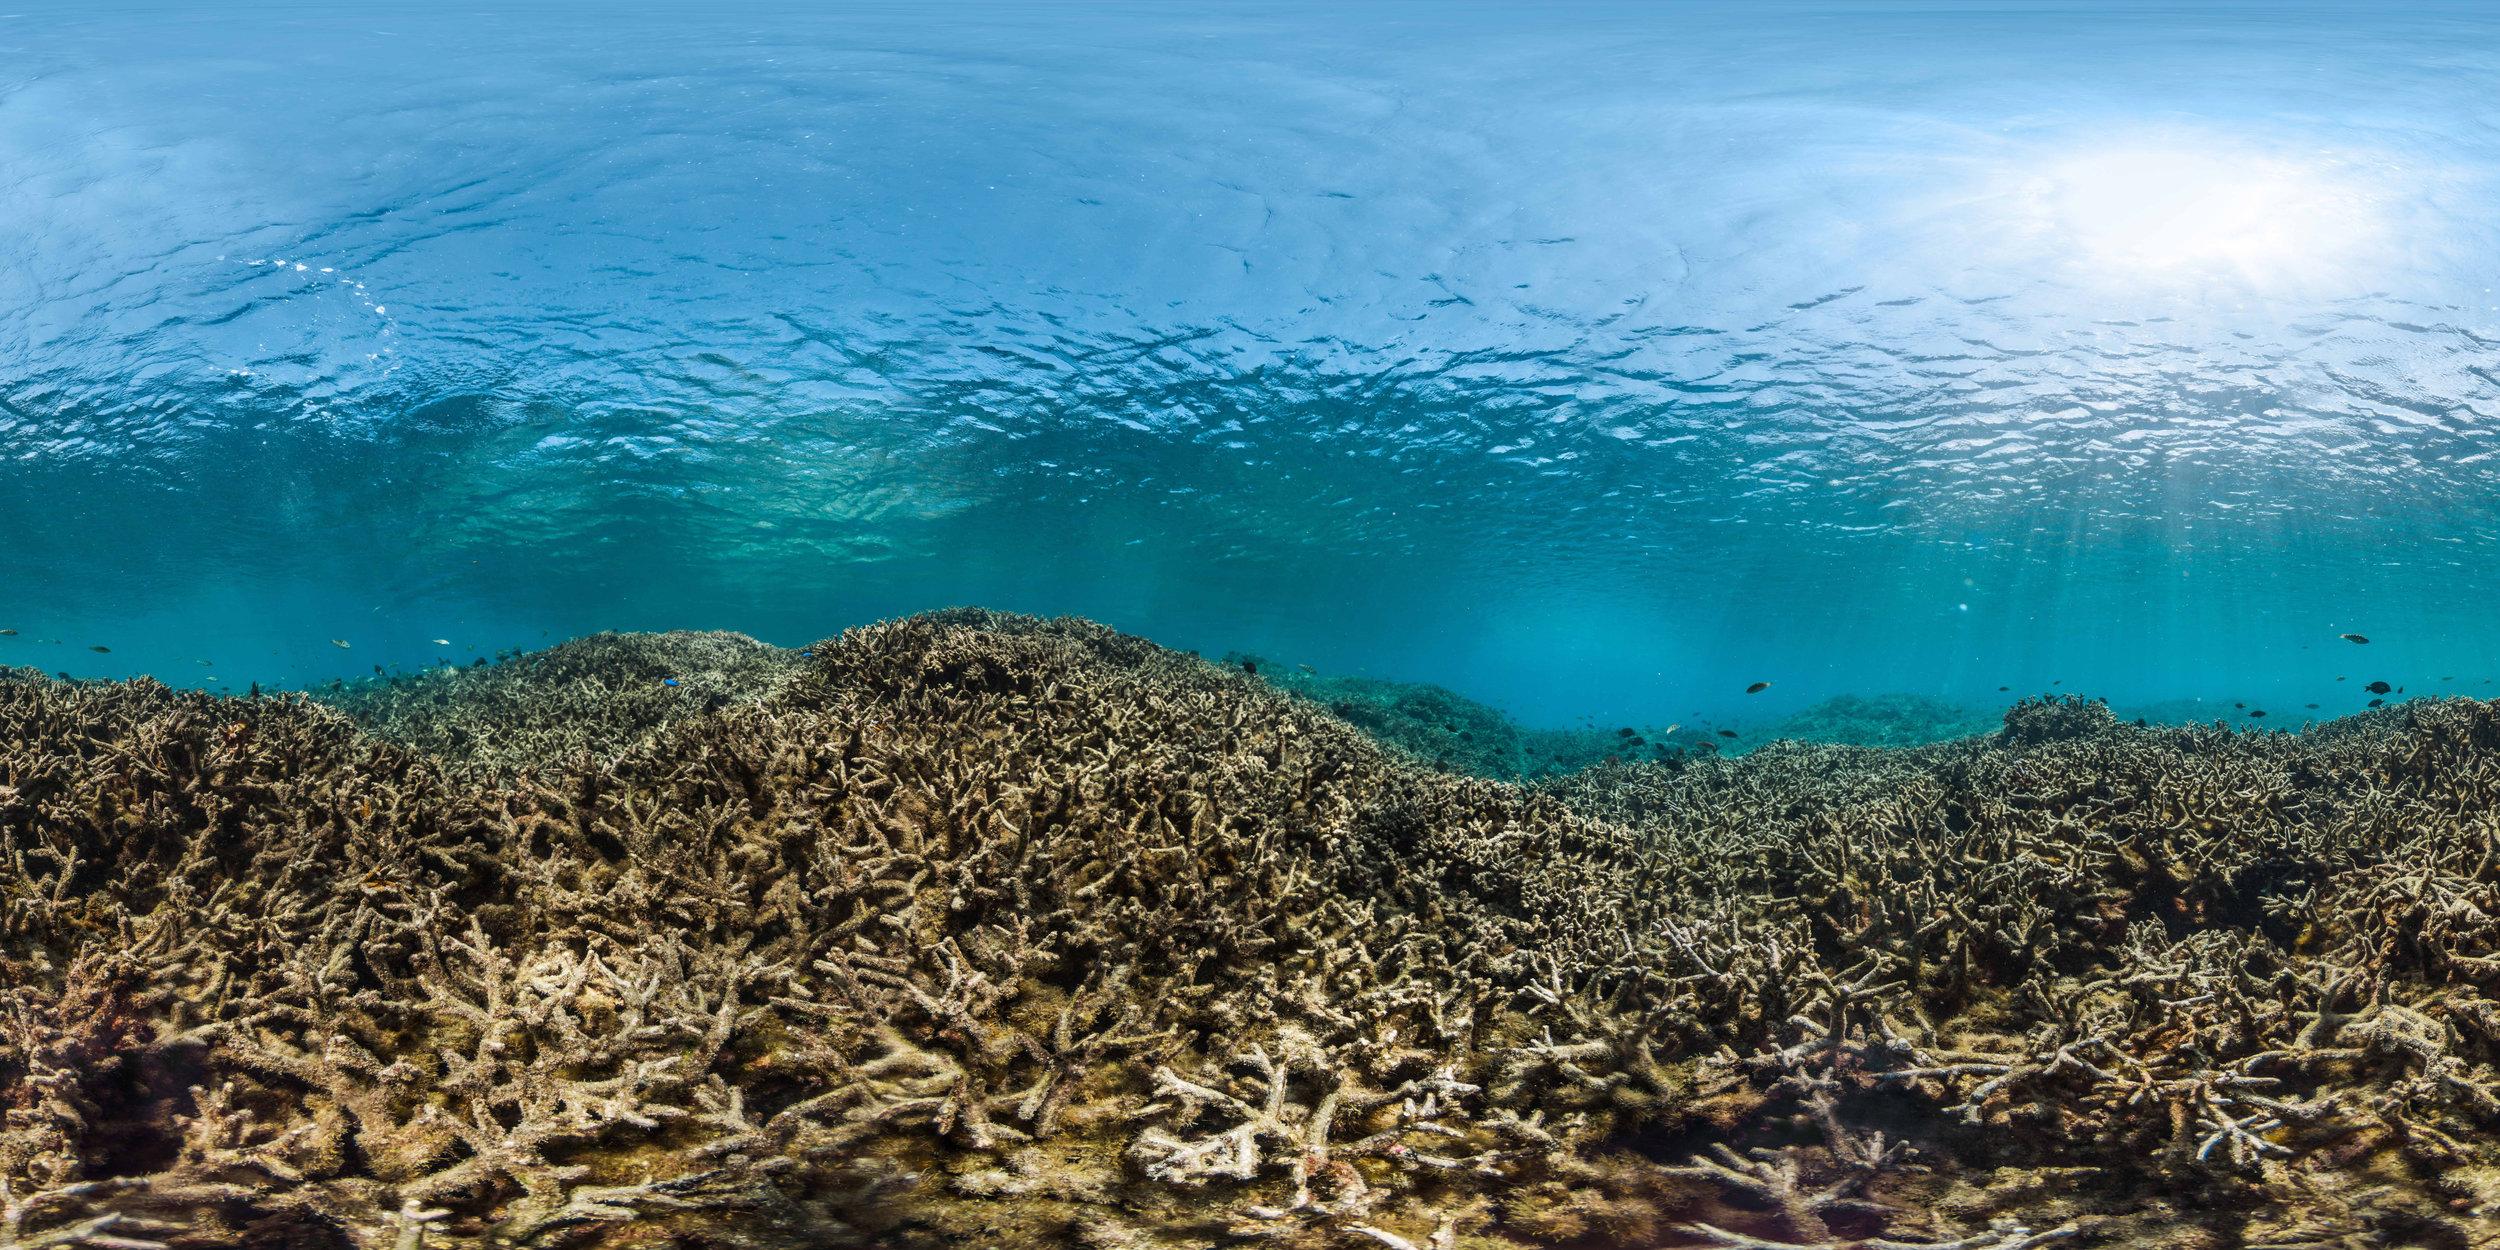 american samoa, aug 2015 credit: THE OCEAN AGENCY / XL CATLIN SEAVIEW SURVEY